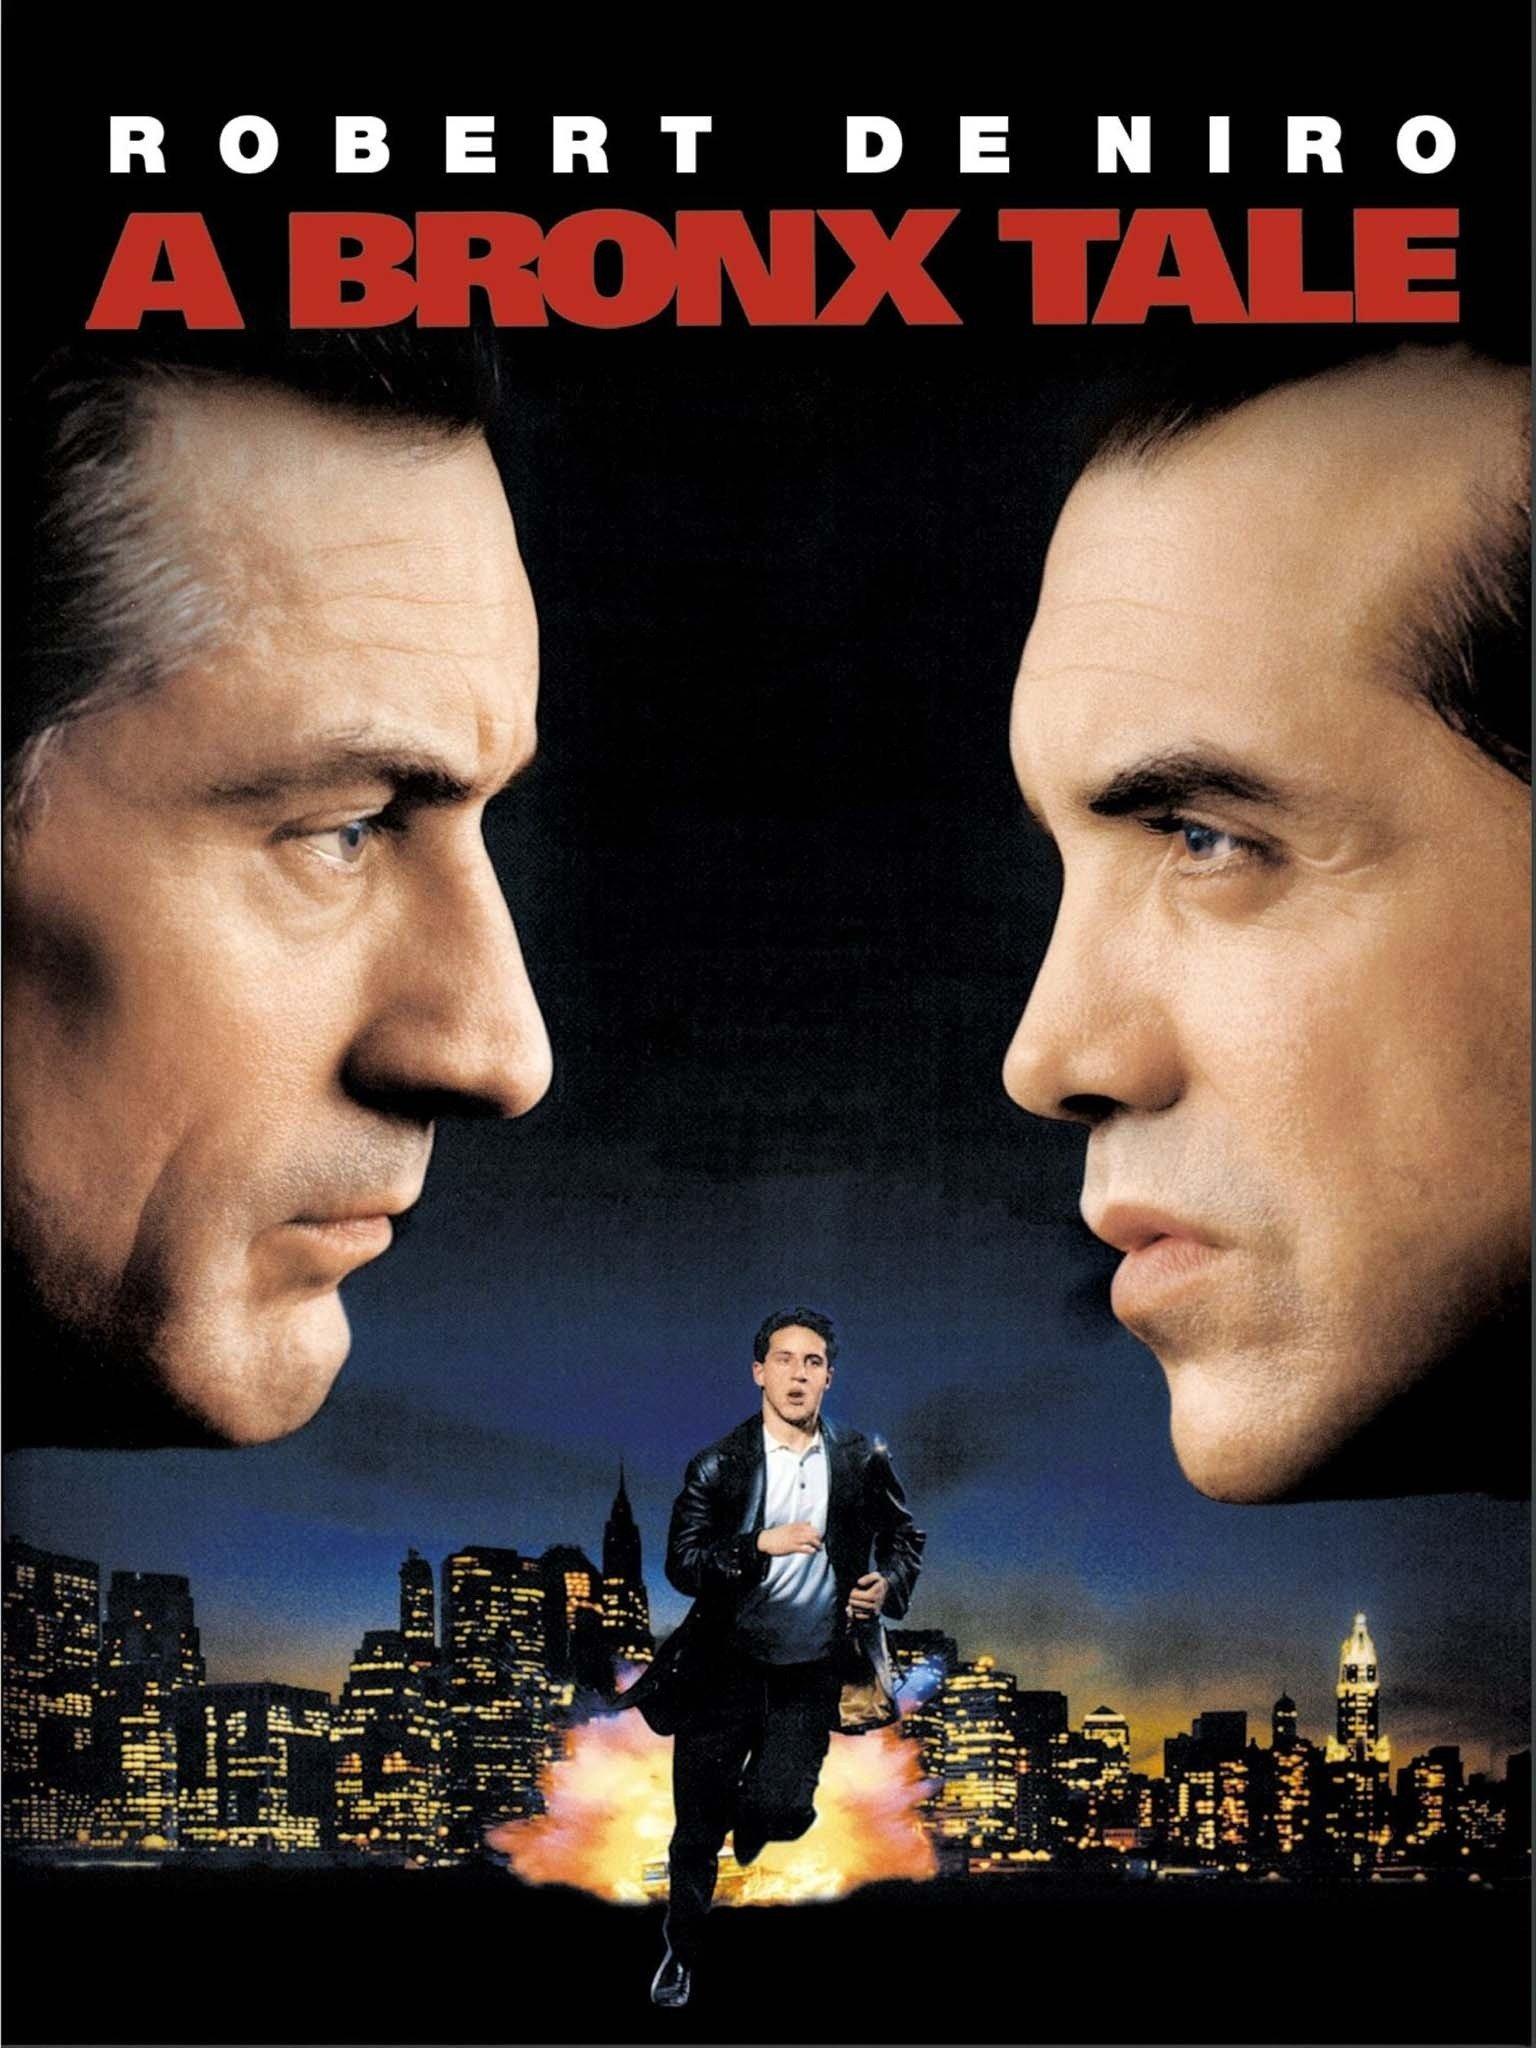 Bronx tale movie a 10+ Best